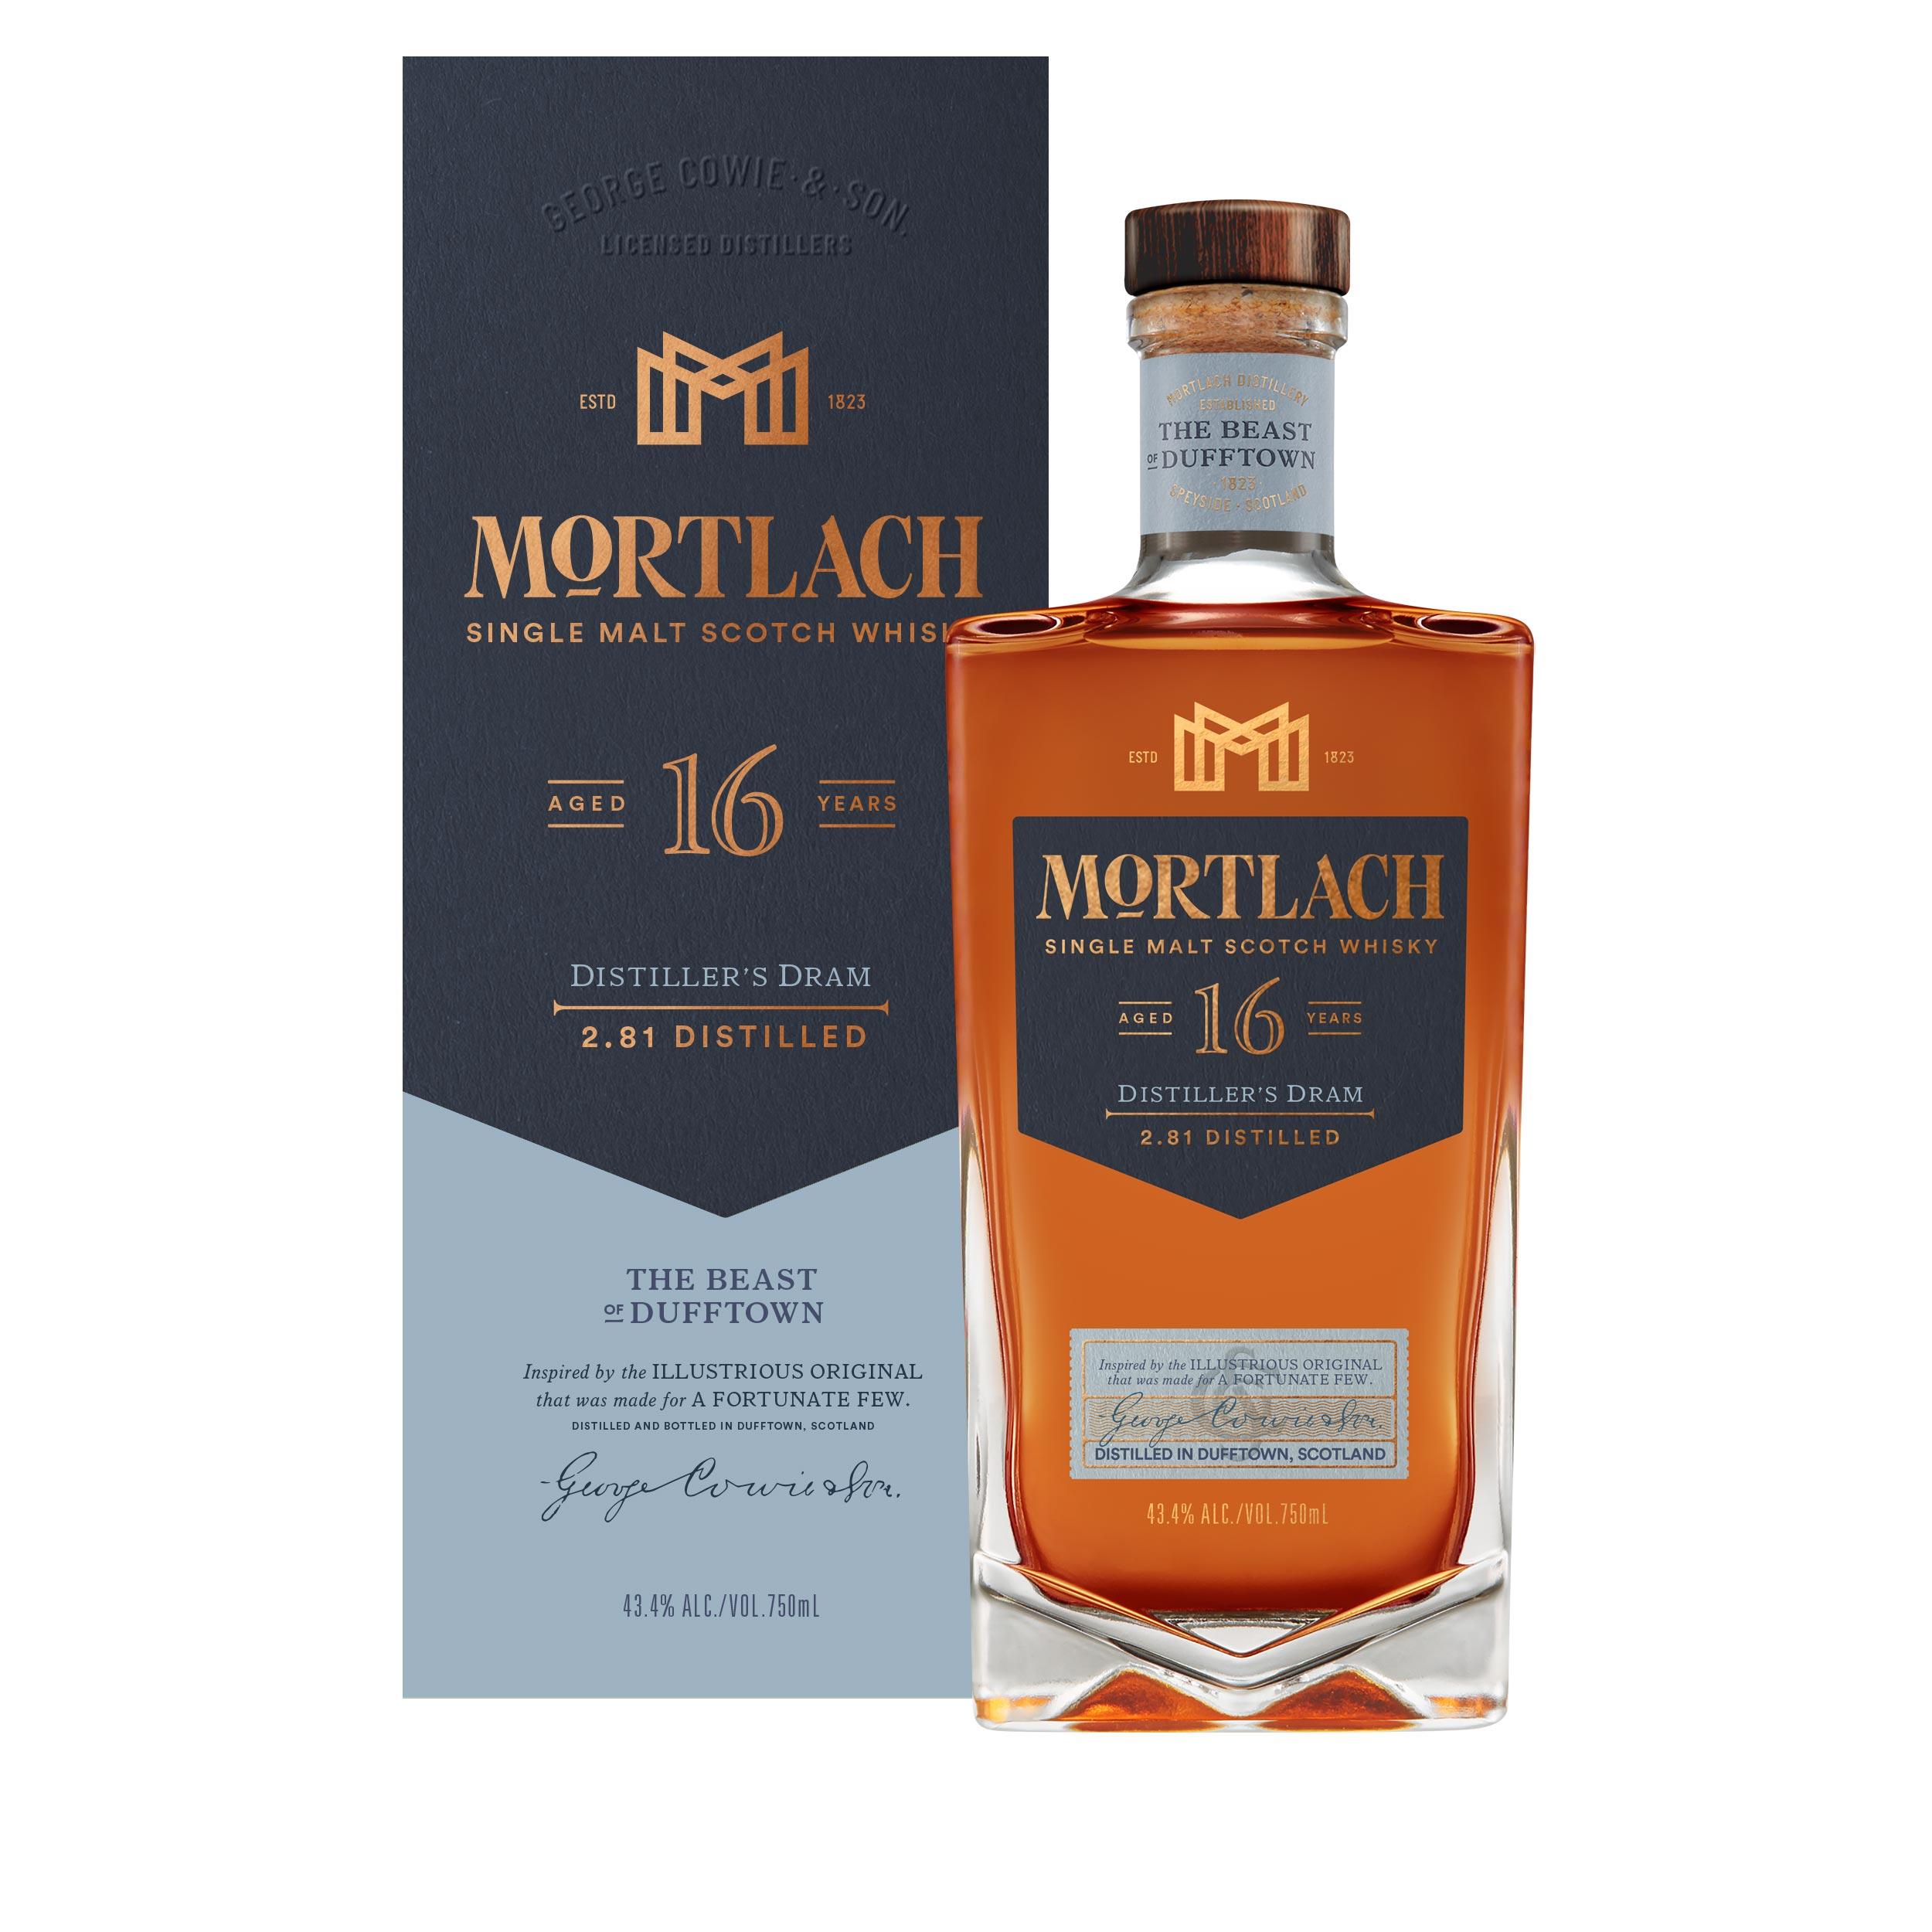 Mortlach 16 Year Old Distillers Dram Speyside Single Malt Scotch Whisky 70cl